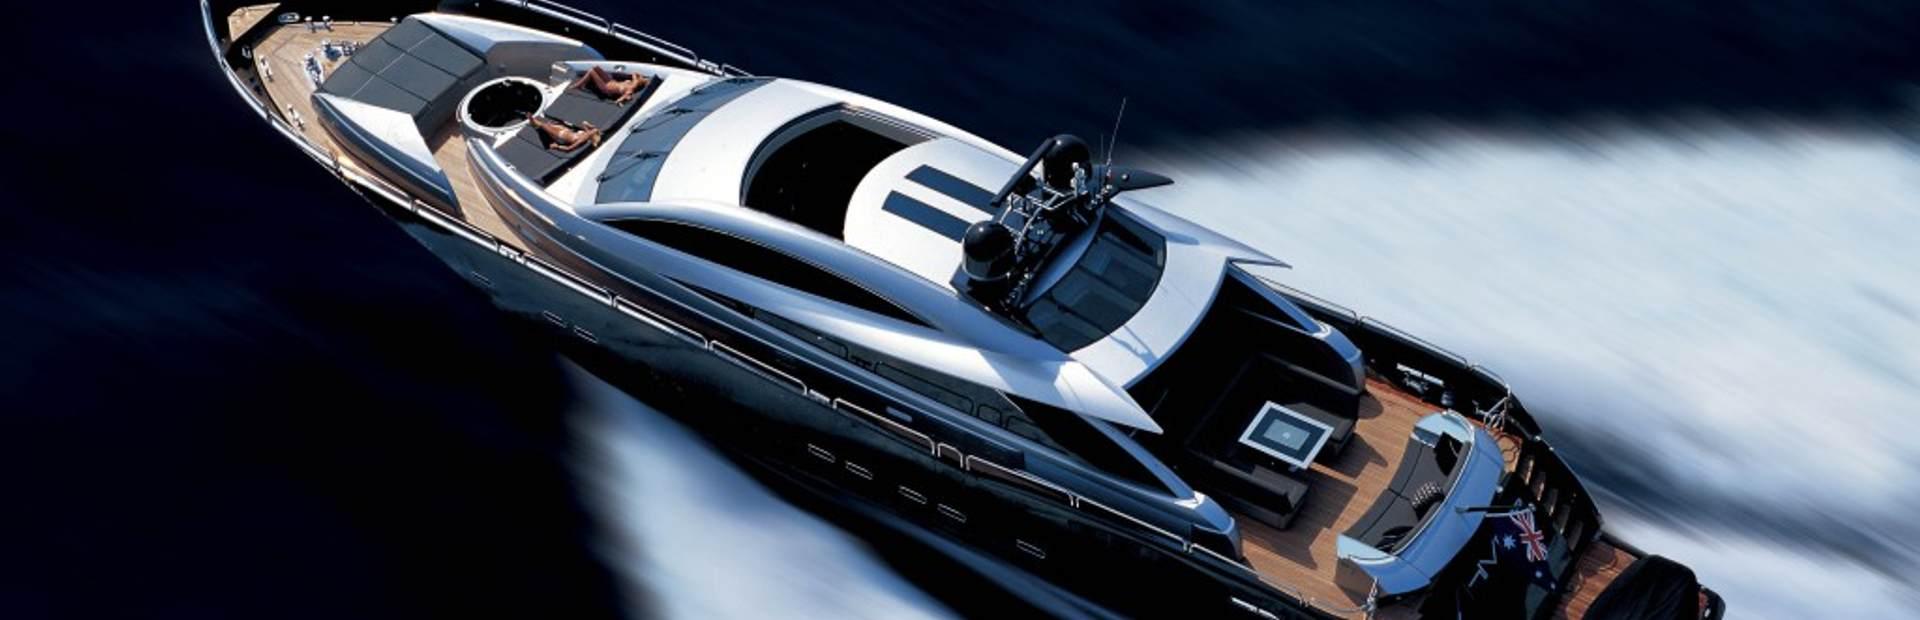 Predator 108 Yacht Charter